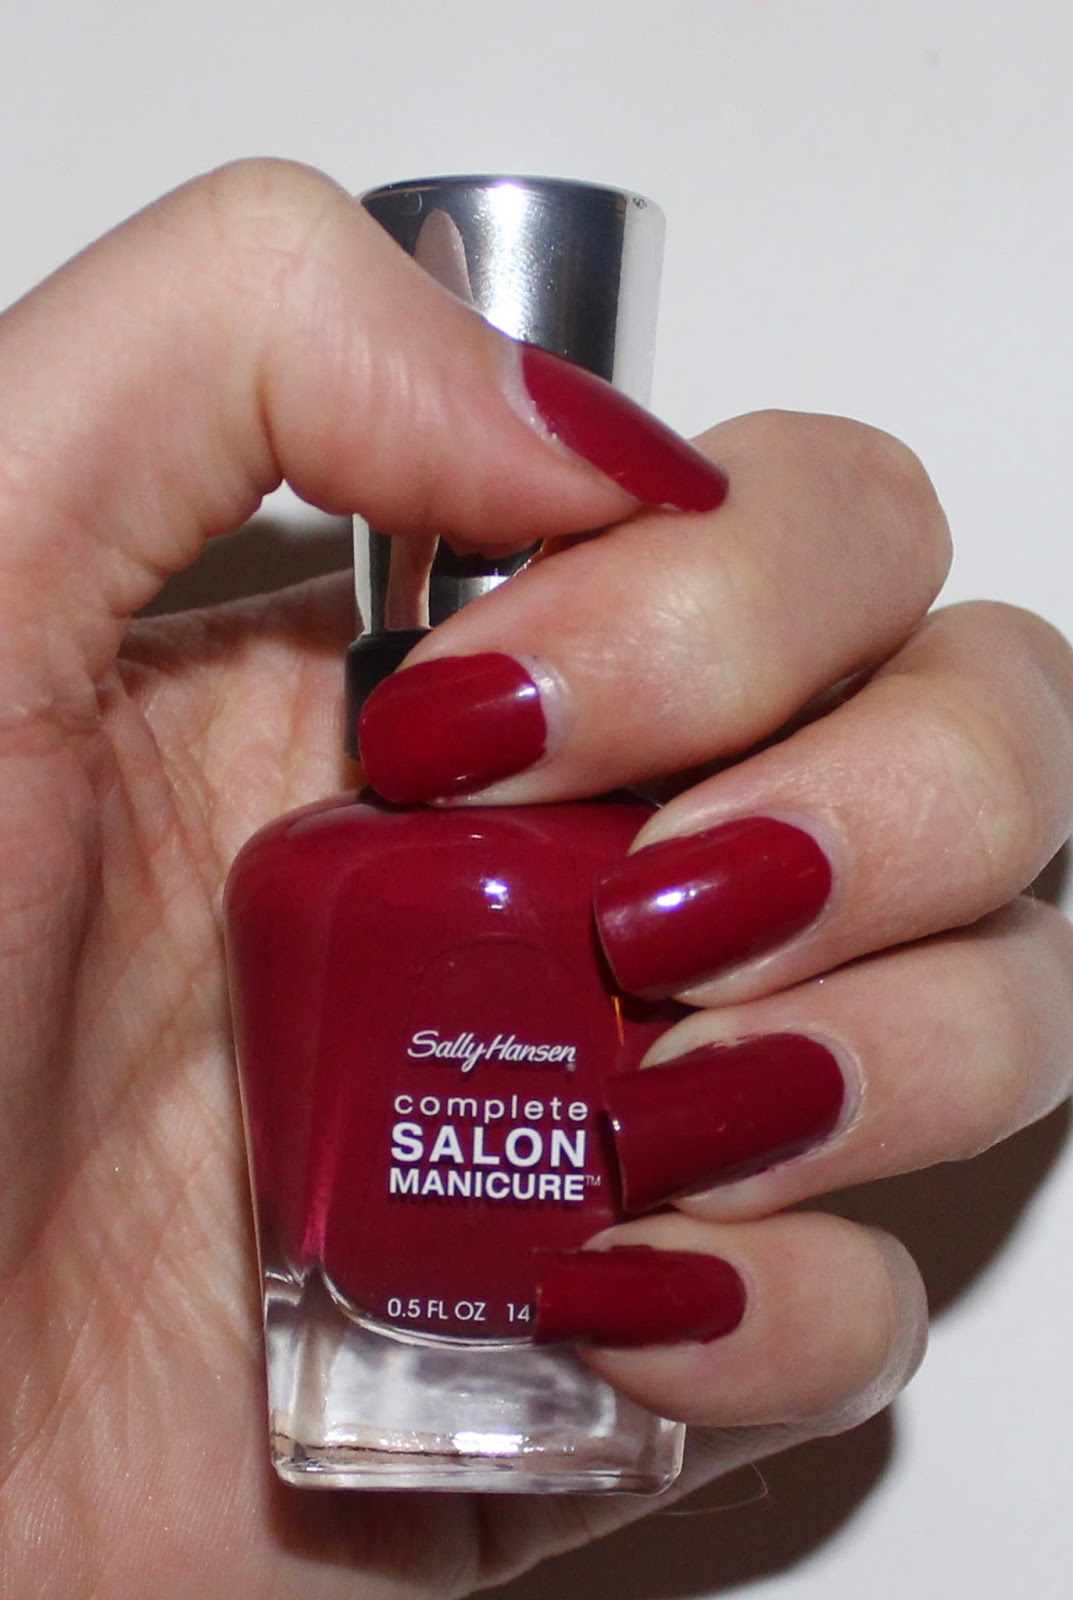 Sally Hansen Complete Salon Manicure in Rhododendron